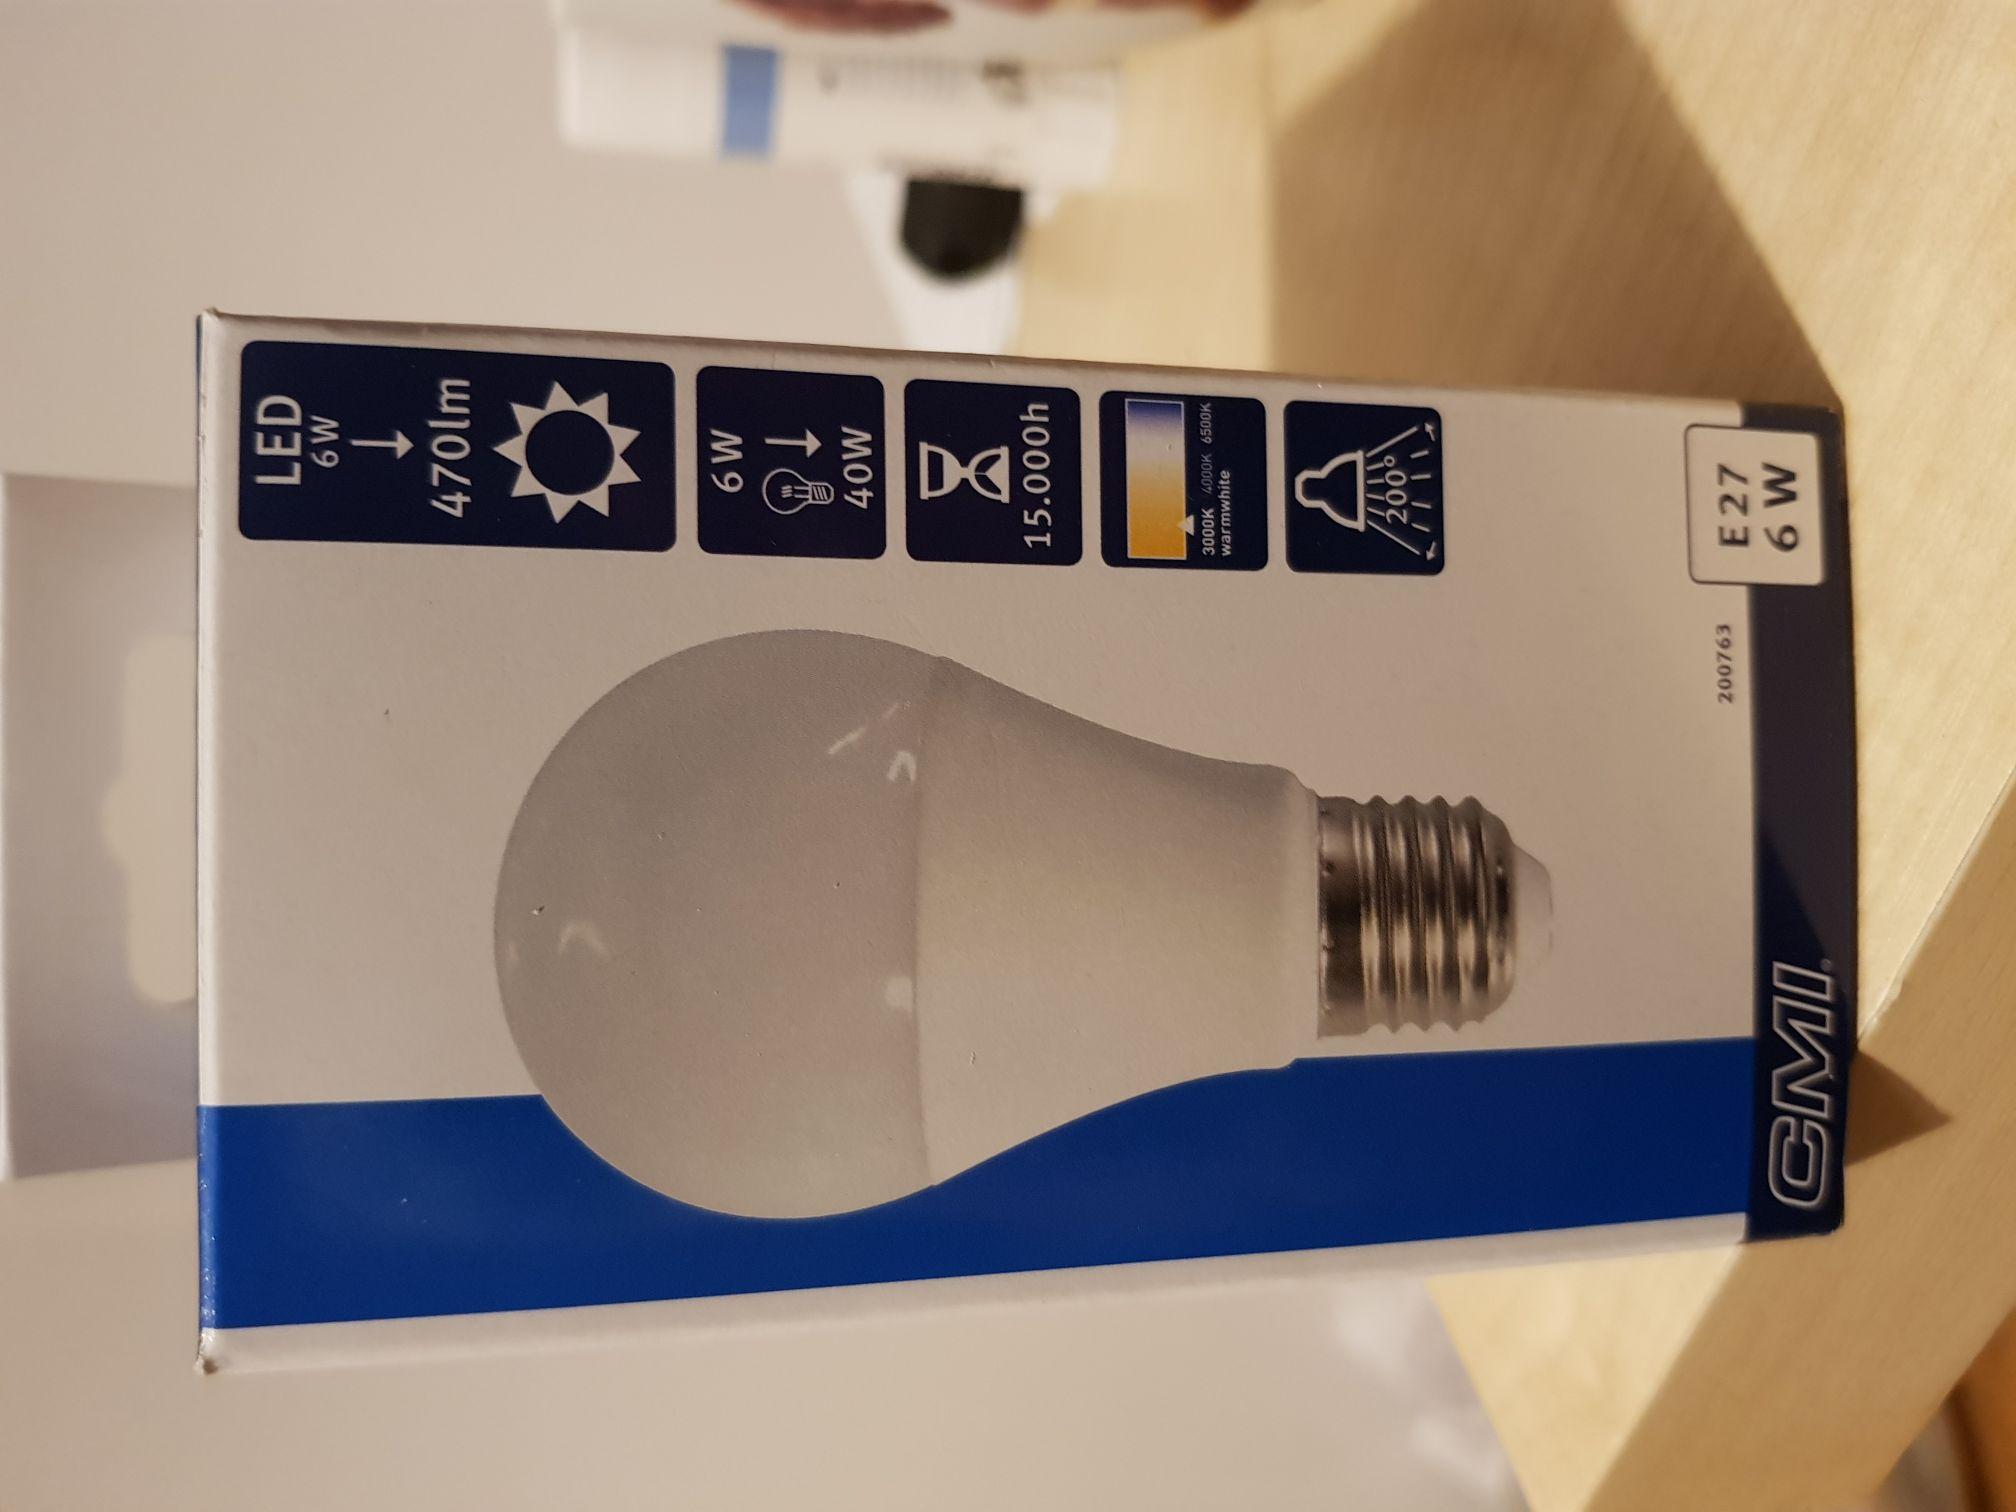 Żarówka LED CMI, 6W 470lm, 15.000h, 3000K, Obi